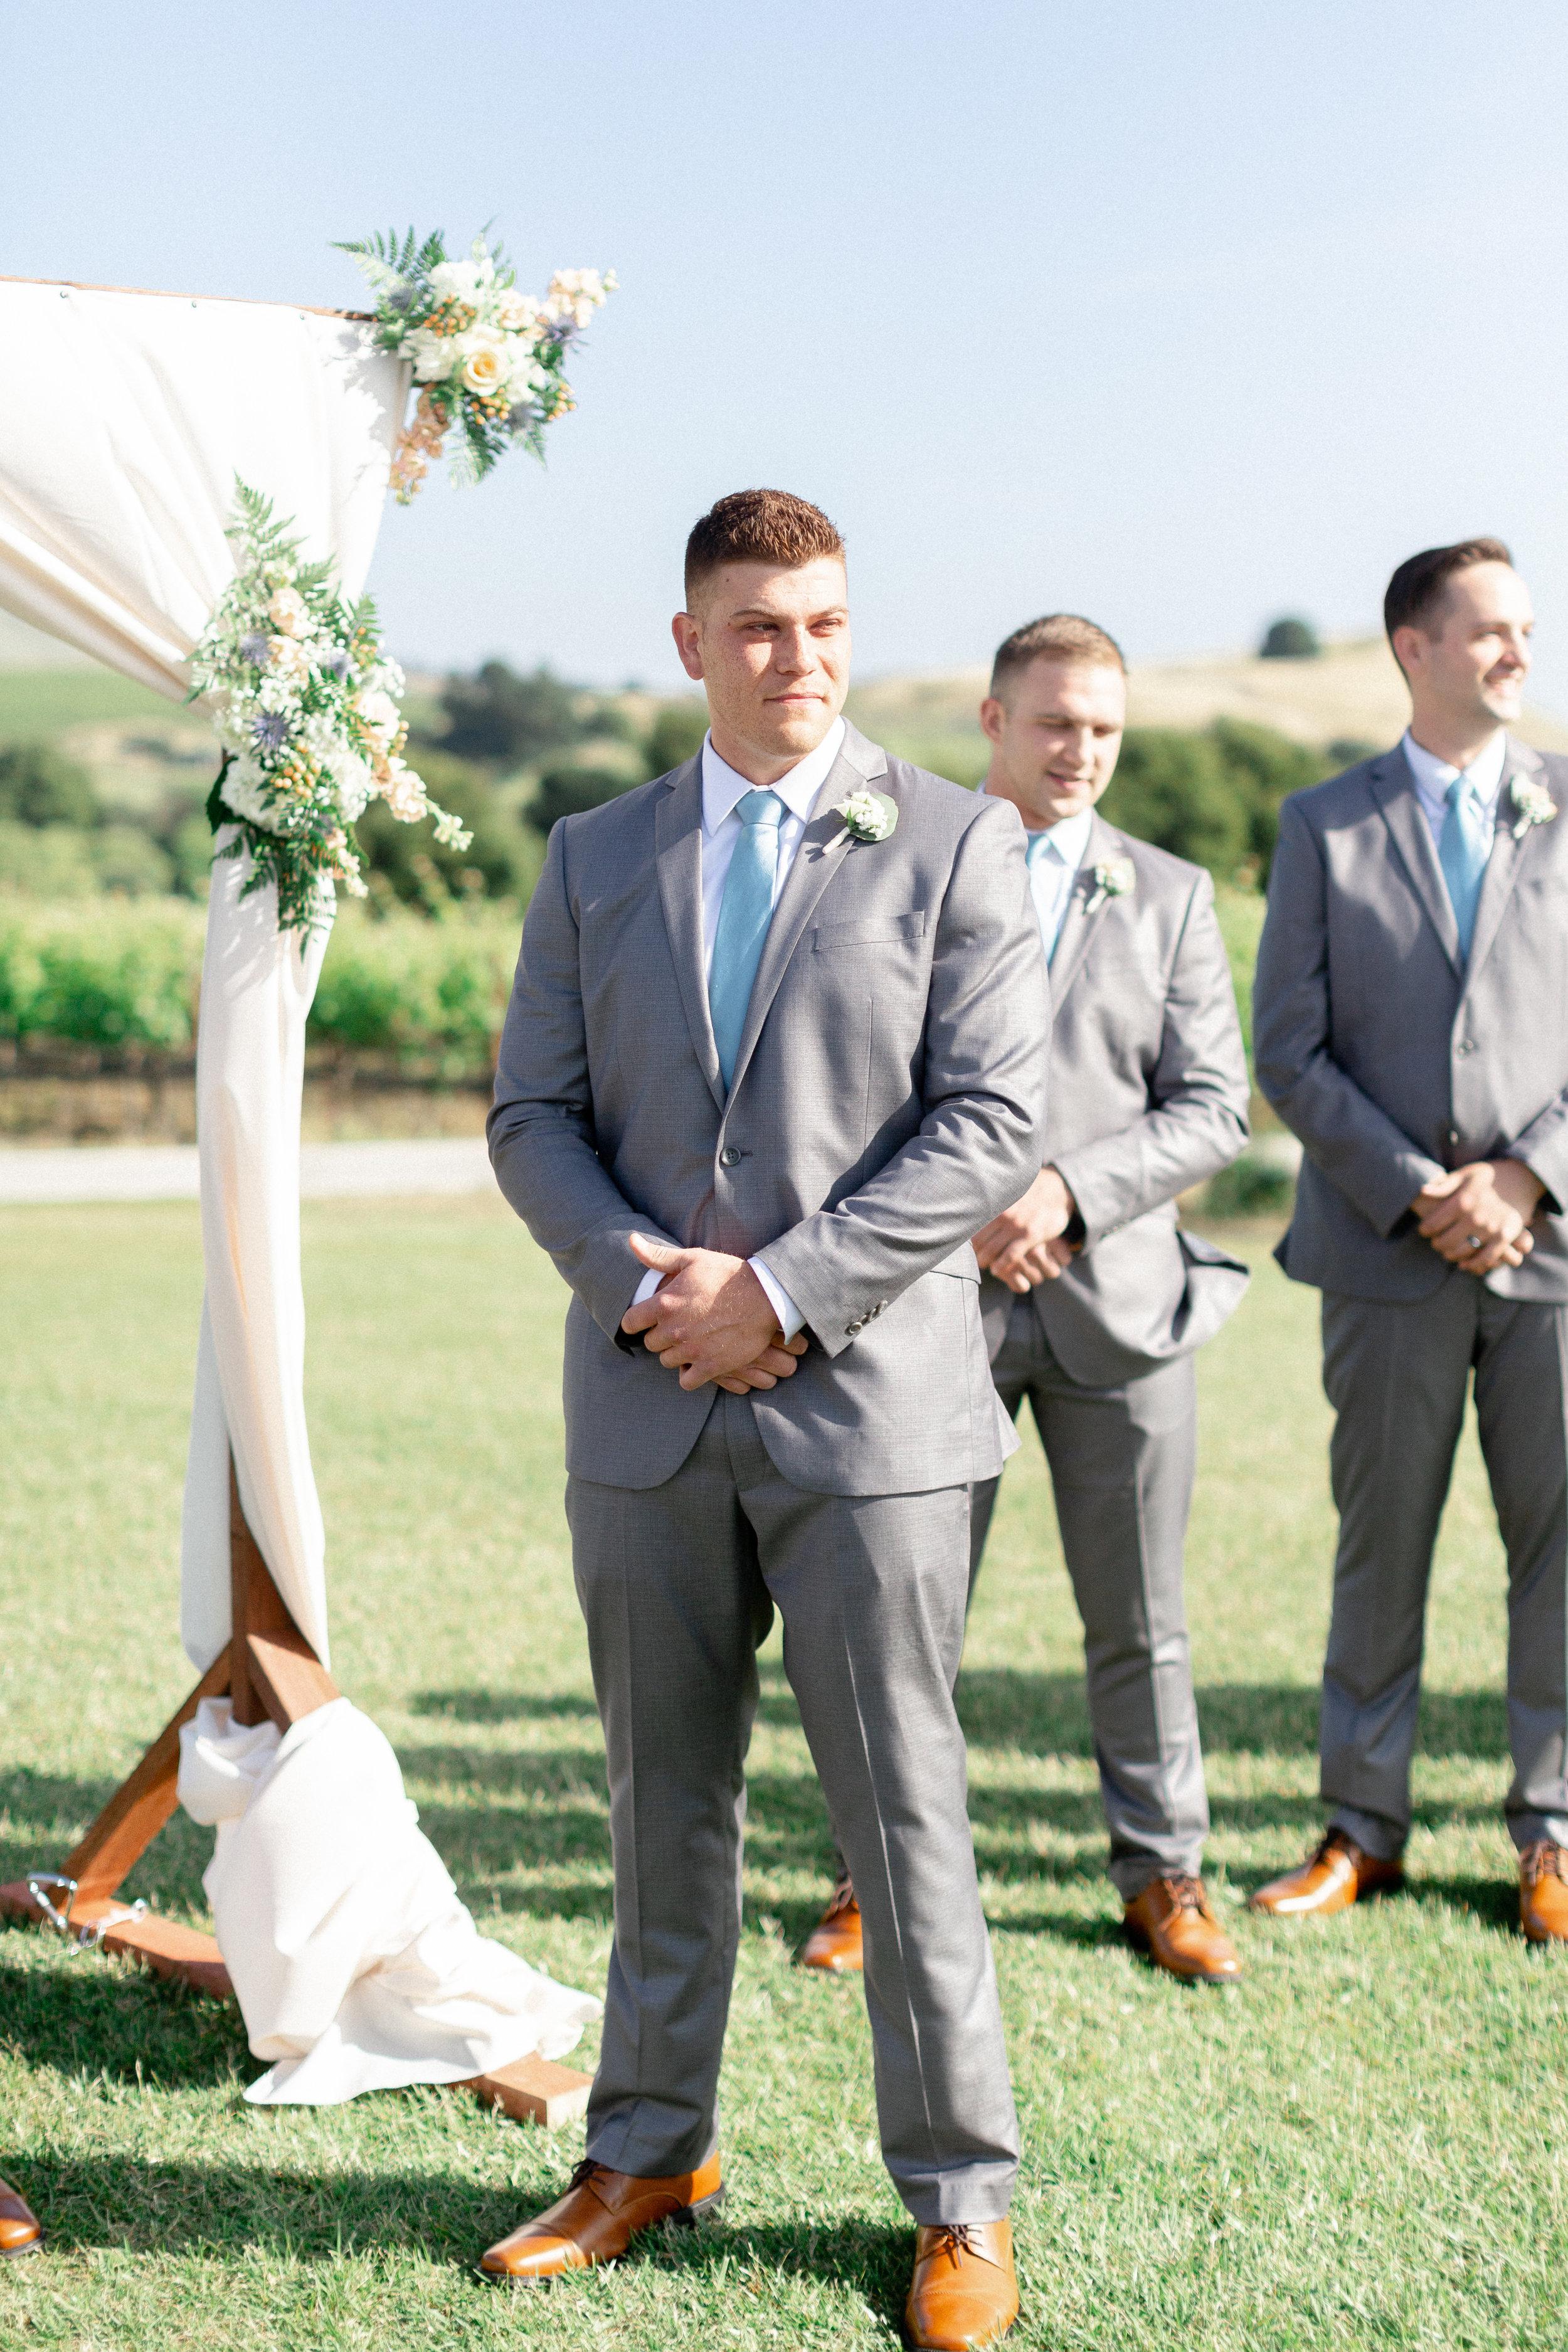 california-wedding-photographer-at-eagle-vines-golf-course.jpg